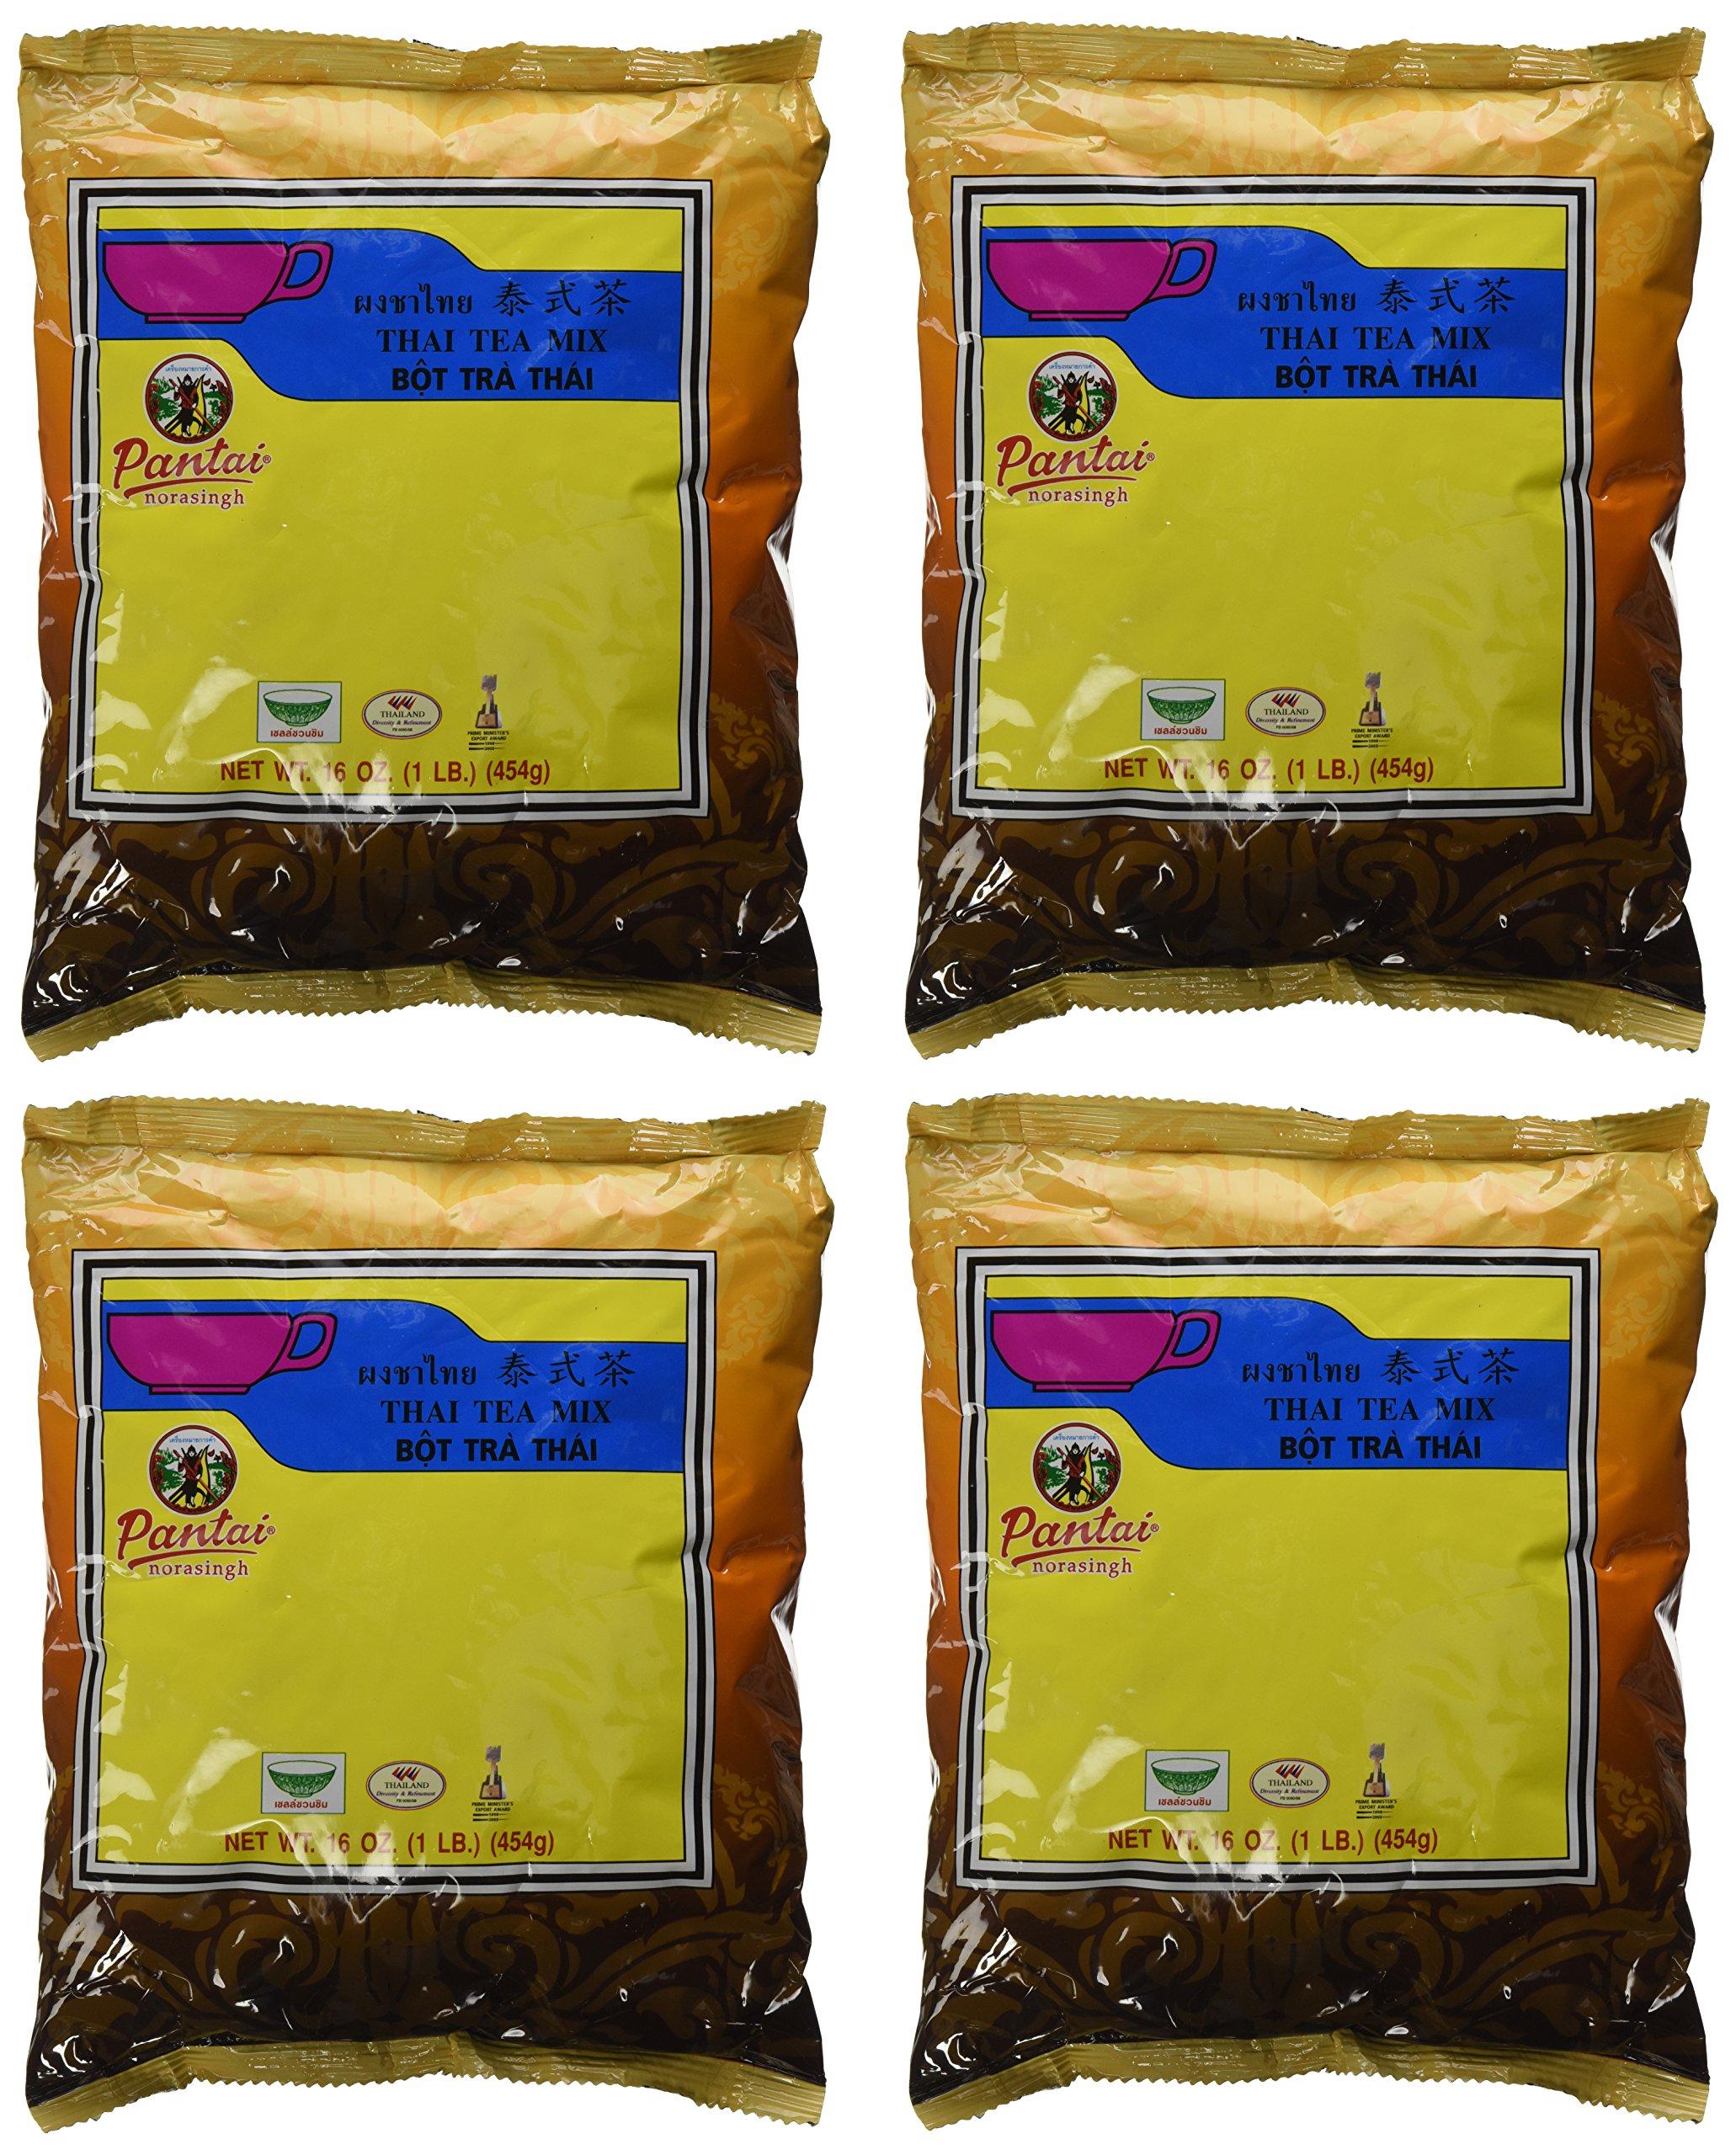 Pantainorasingh Thai Tea Mix, 16-Ounce Bags (Pack of 4) by Pantai Norasingh